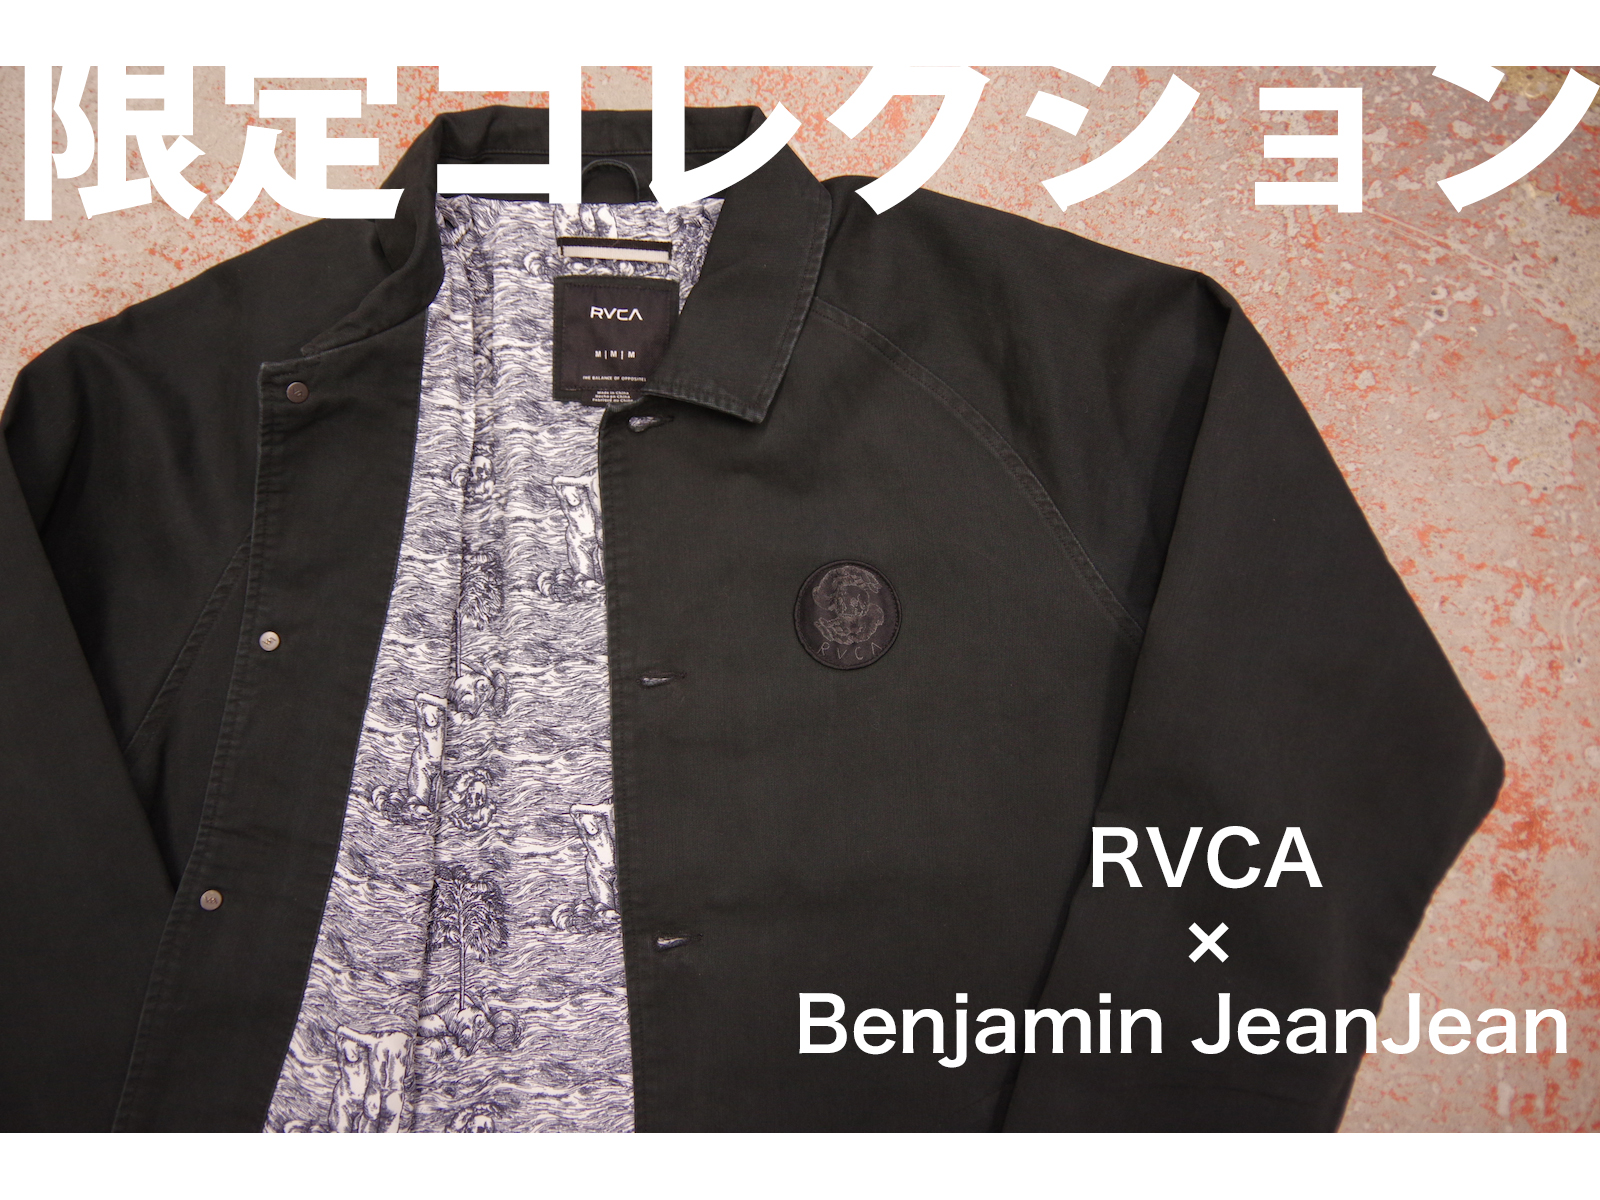 NEW ARRIVALS – RVCA × Benjamin JeanJean